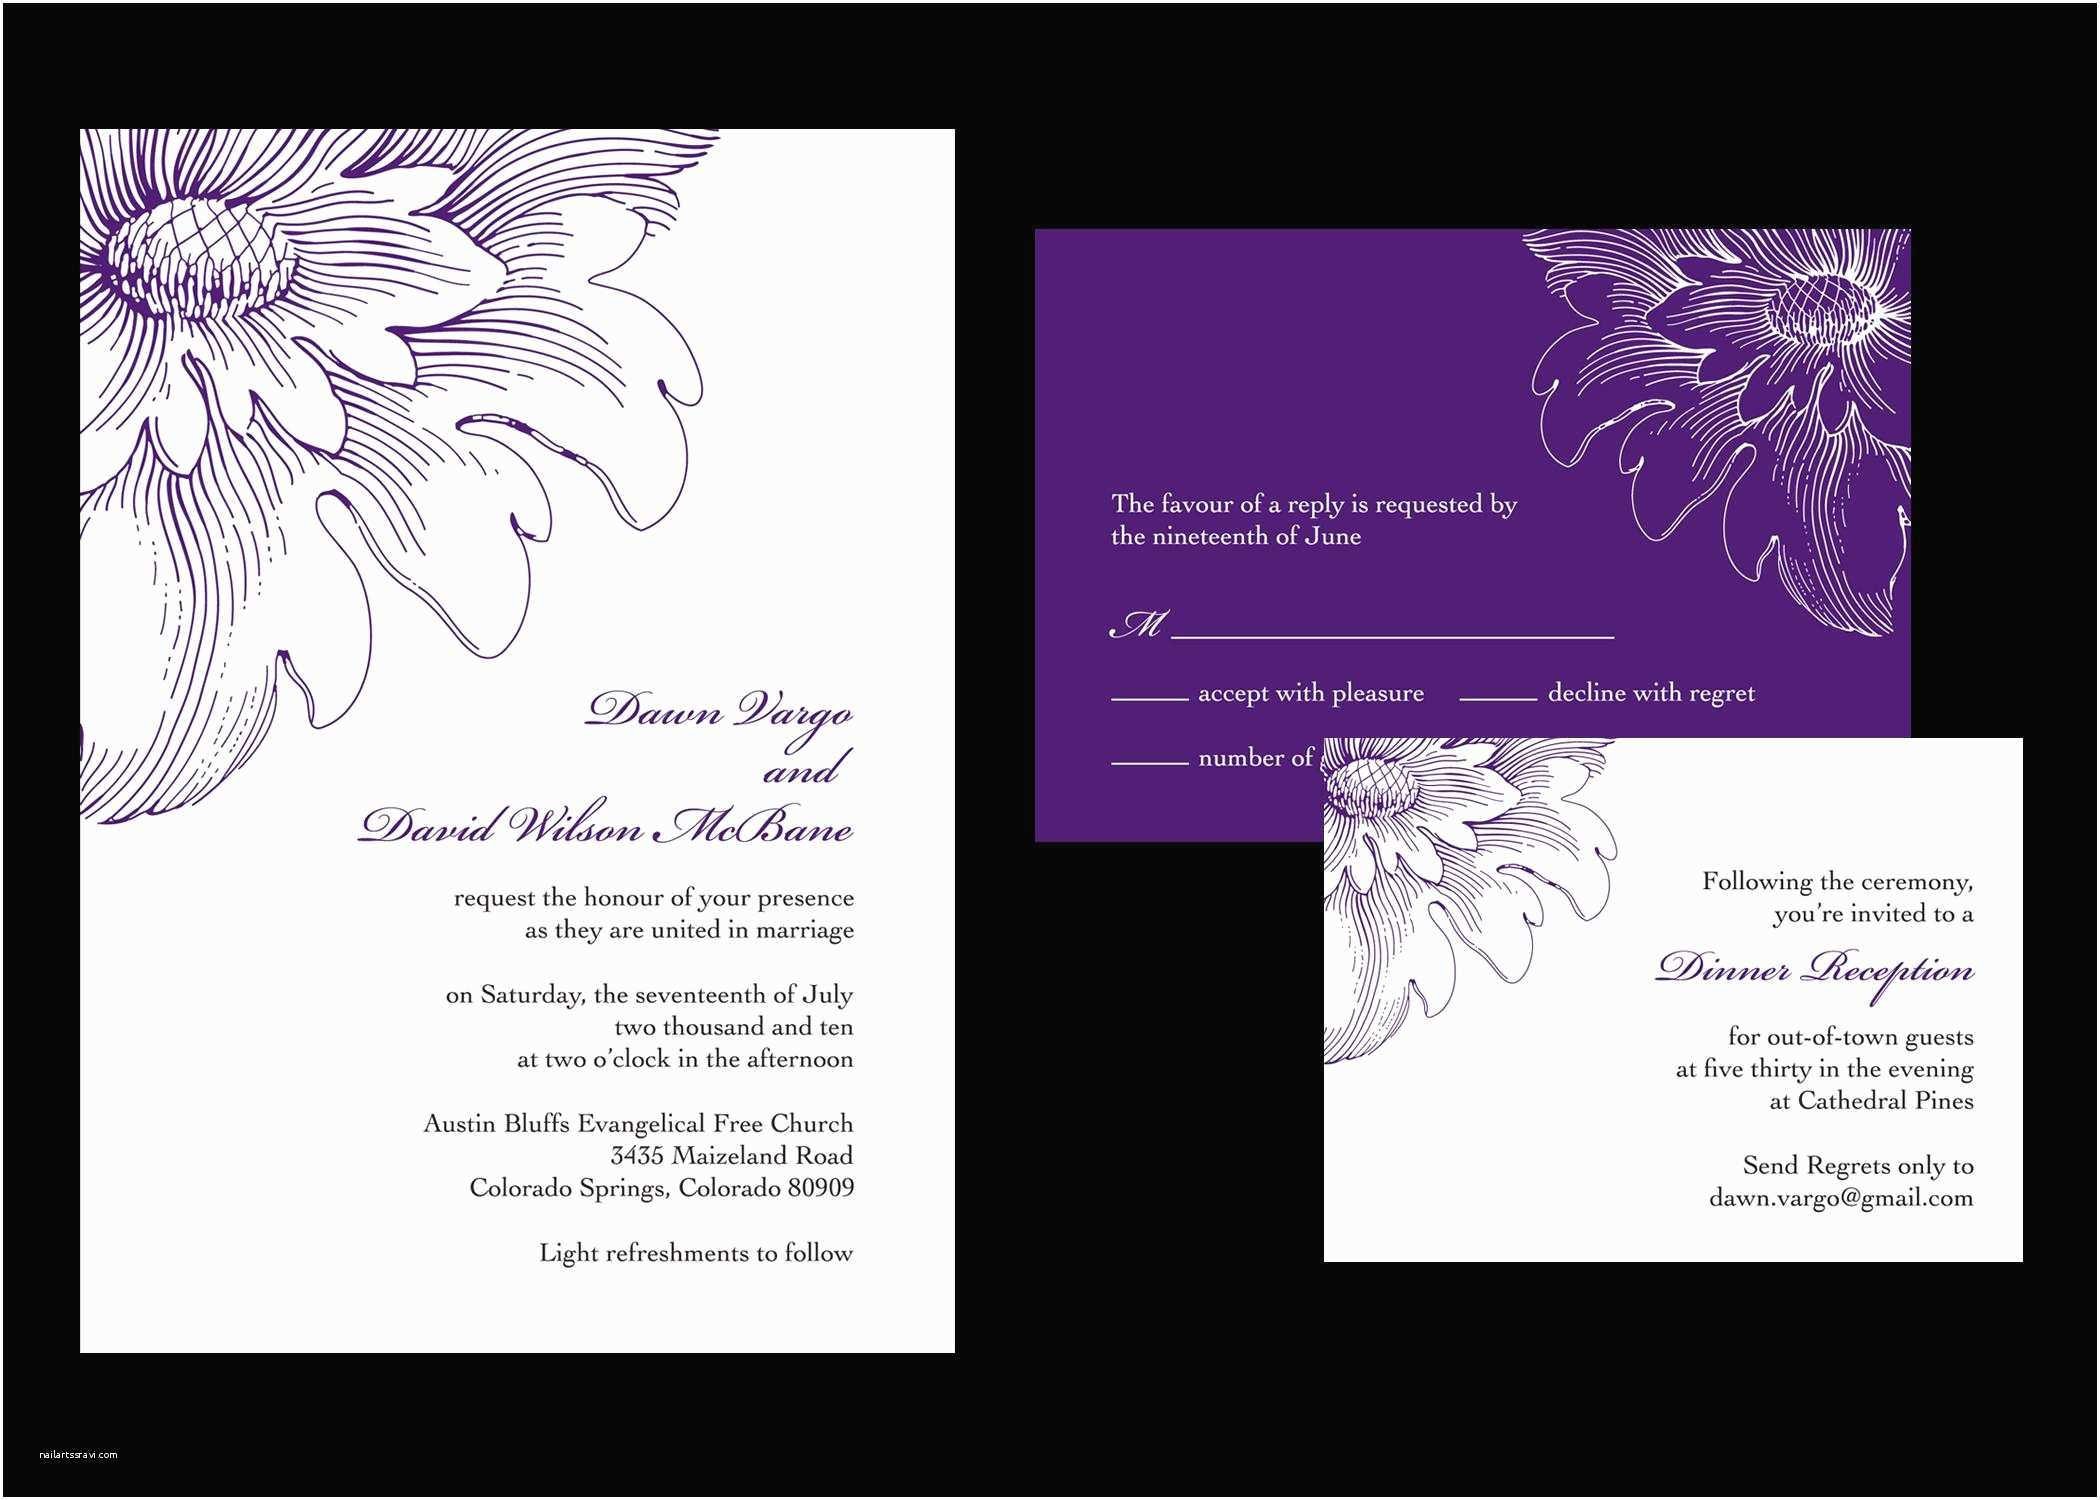 Wedding Etiquette Invitations Emily Post Wedding Invitation Wording Samples Yaseen